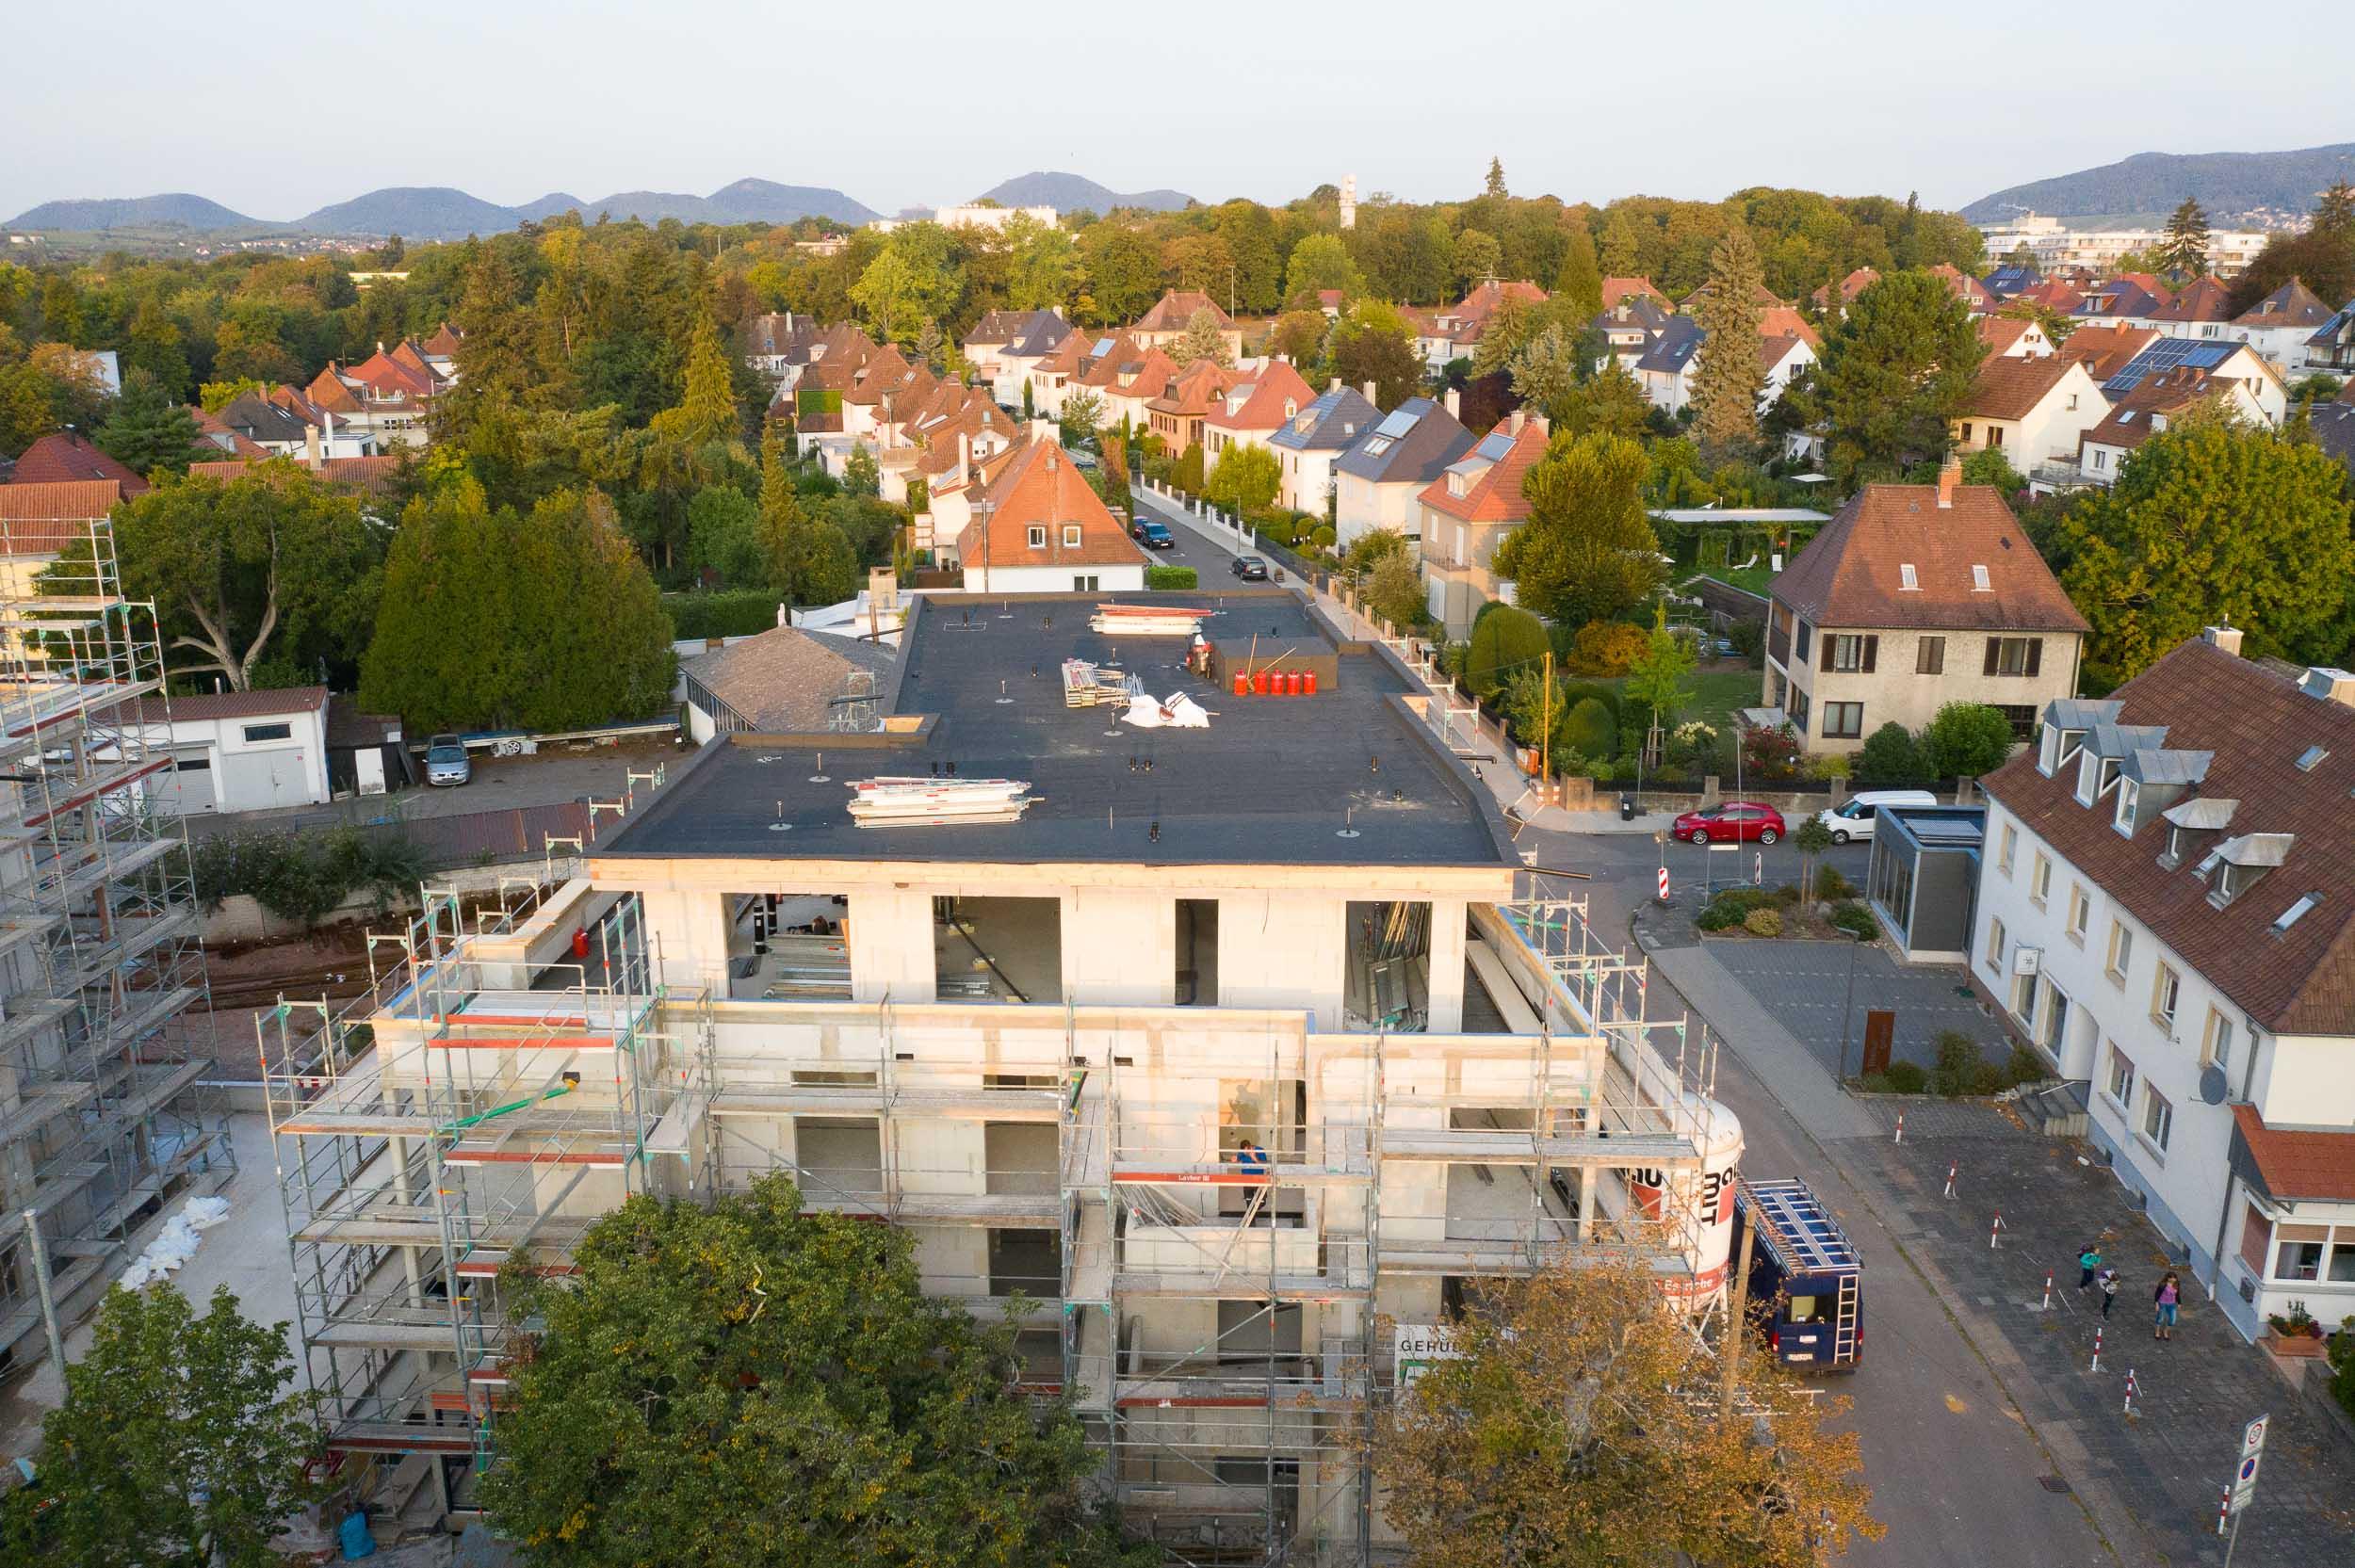 Dachdecker Leydecker-0221